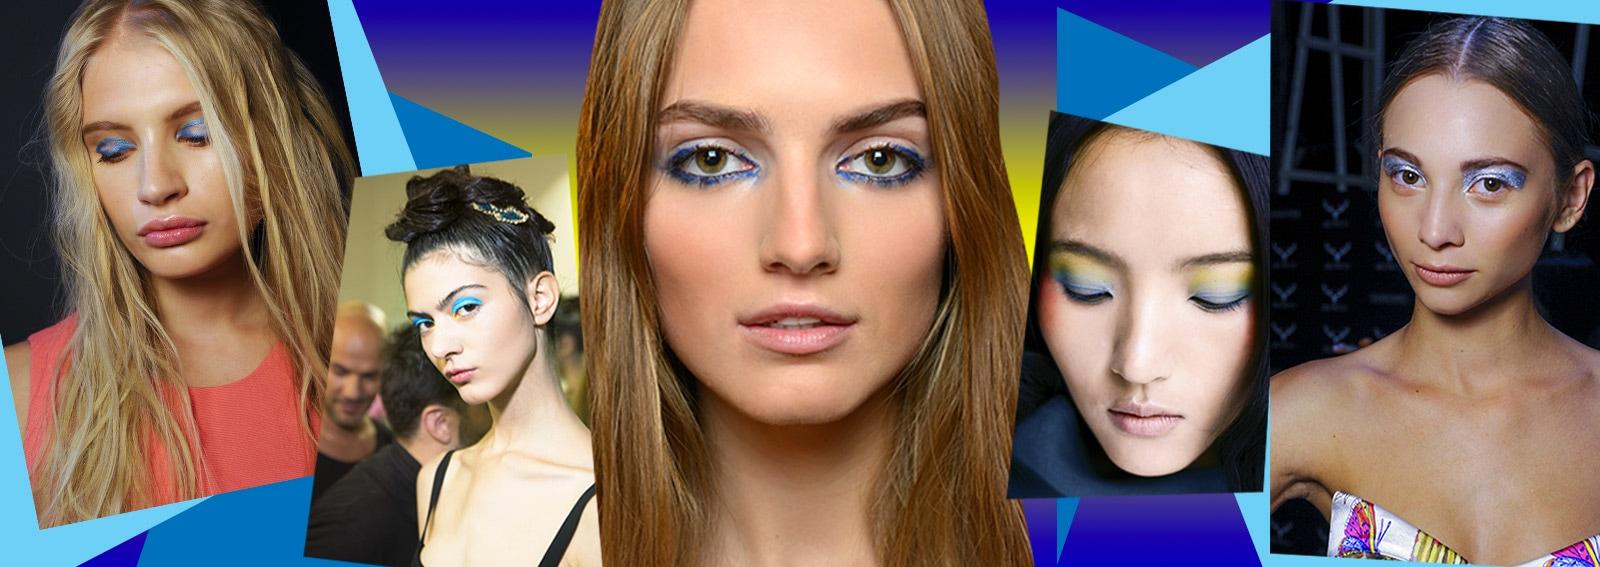 tendenze-make-up-occhi-in-azzurro-desktop